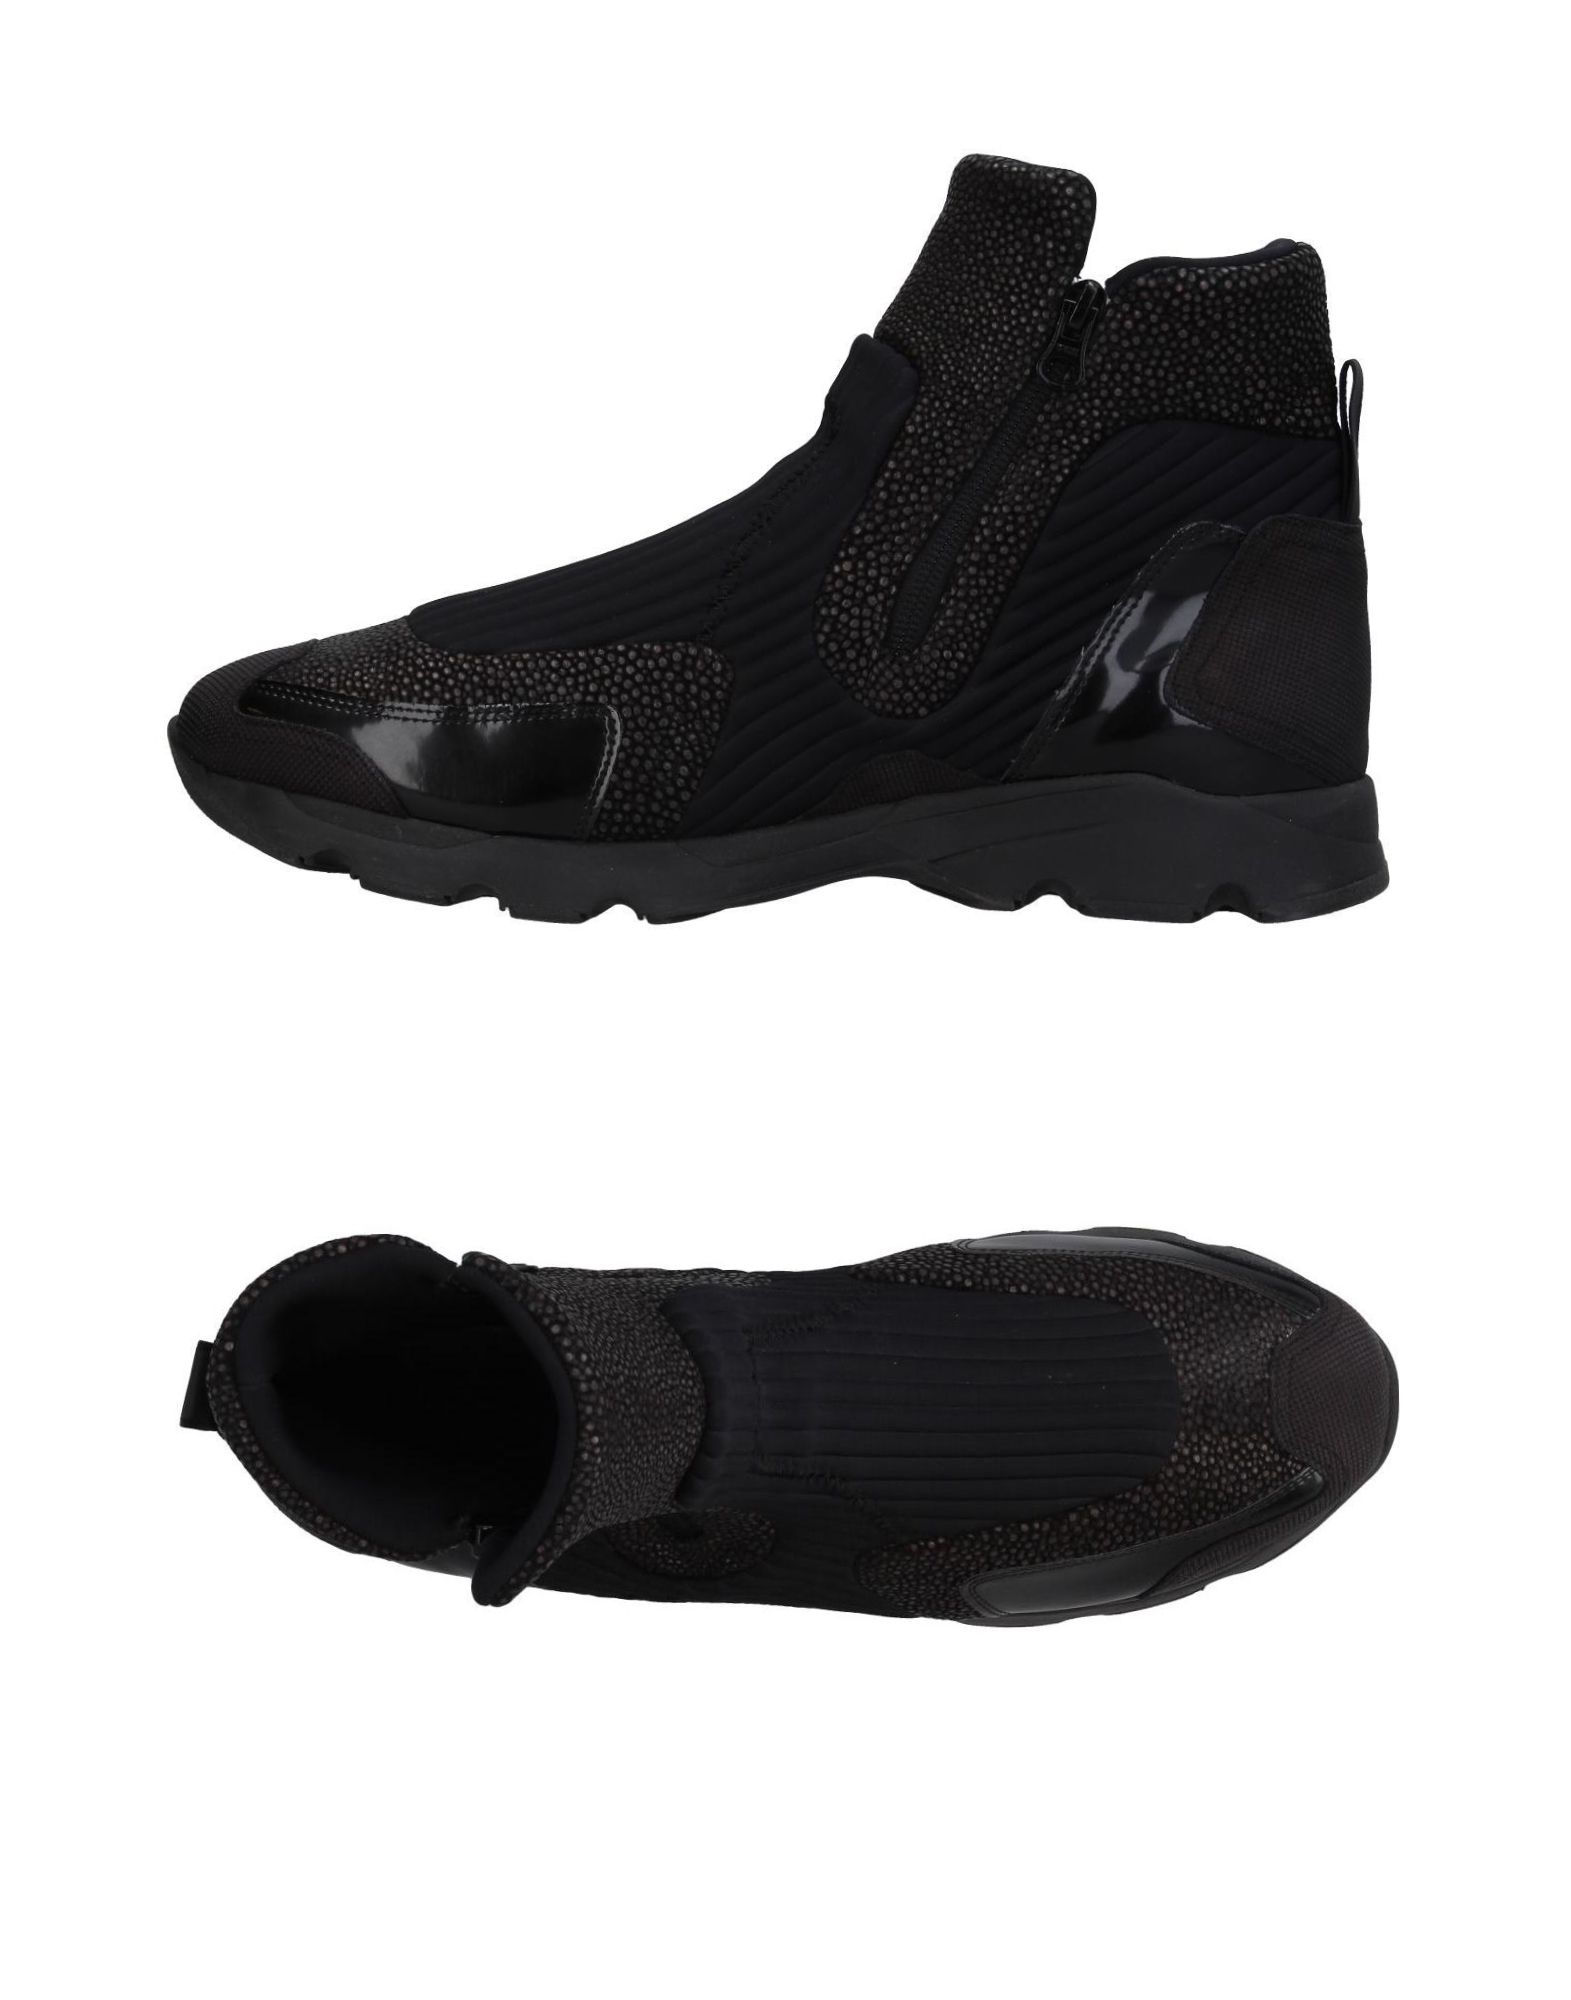 Mm6 Mm6 Mm6 Maison Margiela Sneakers Herren  11401485VX b8f89d